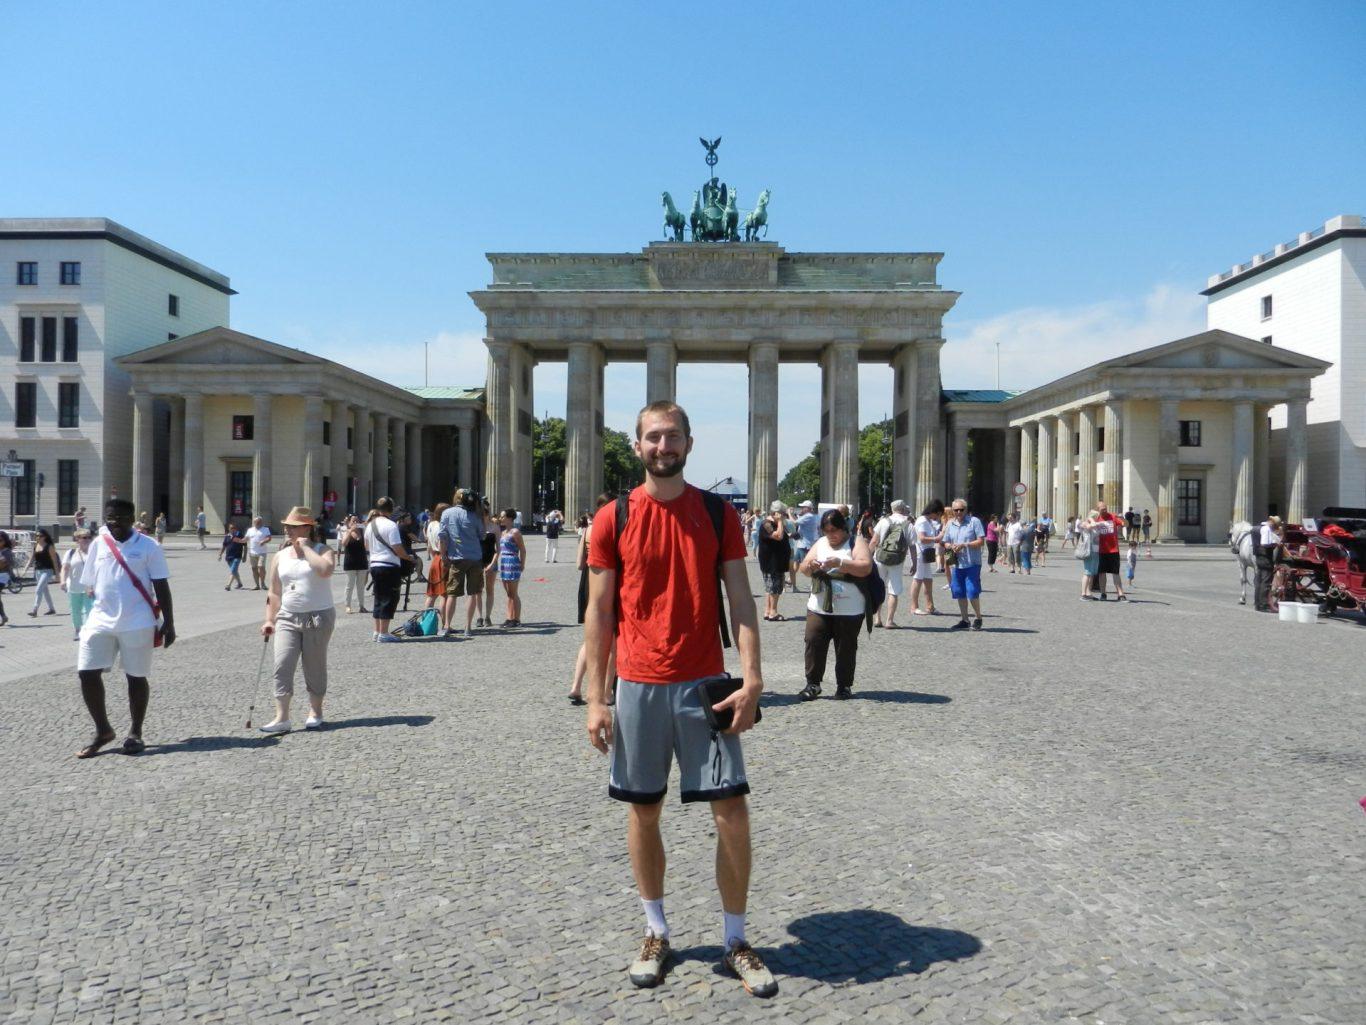 Nathanael in front of Brandenburg Gate in Berlin, Germany